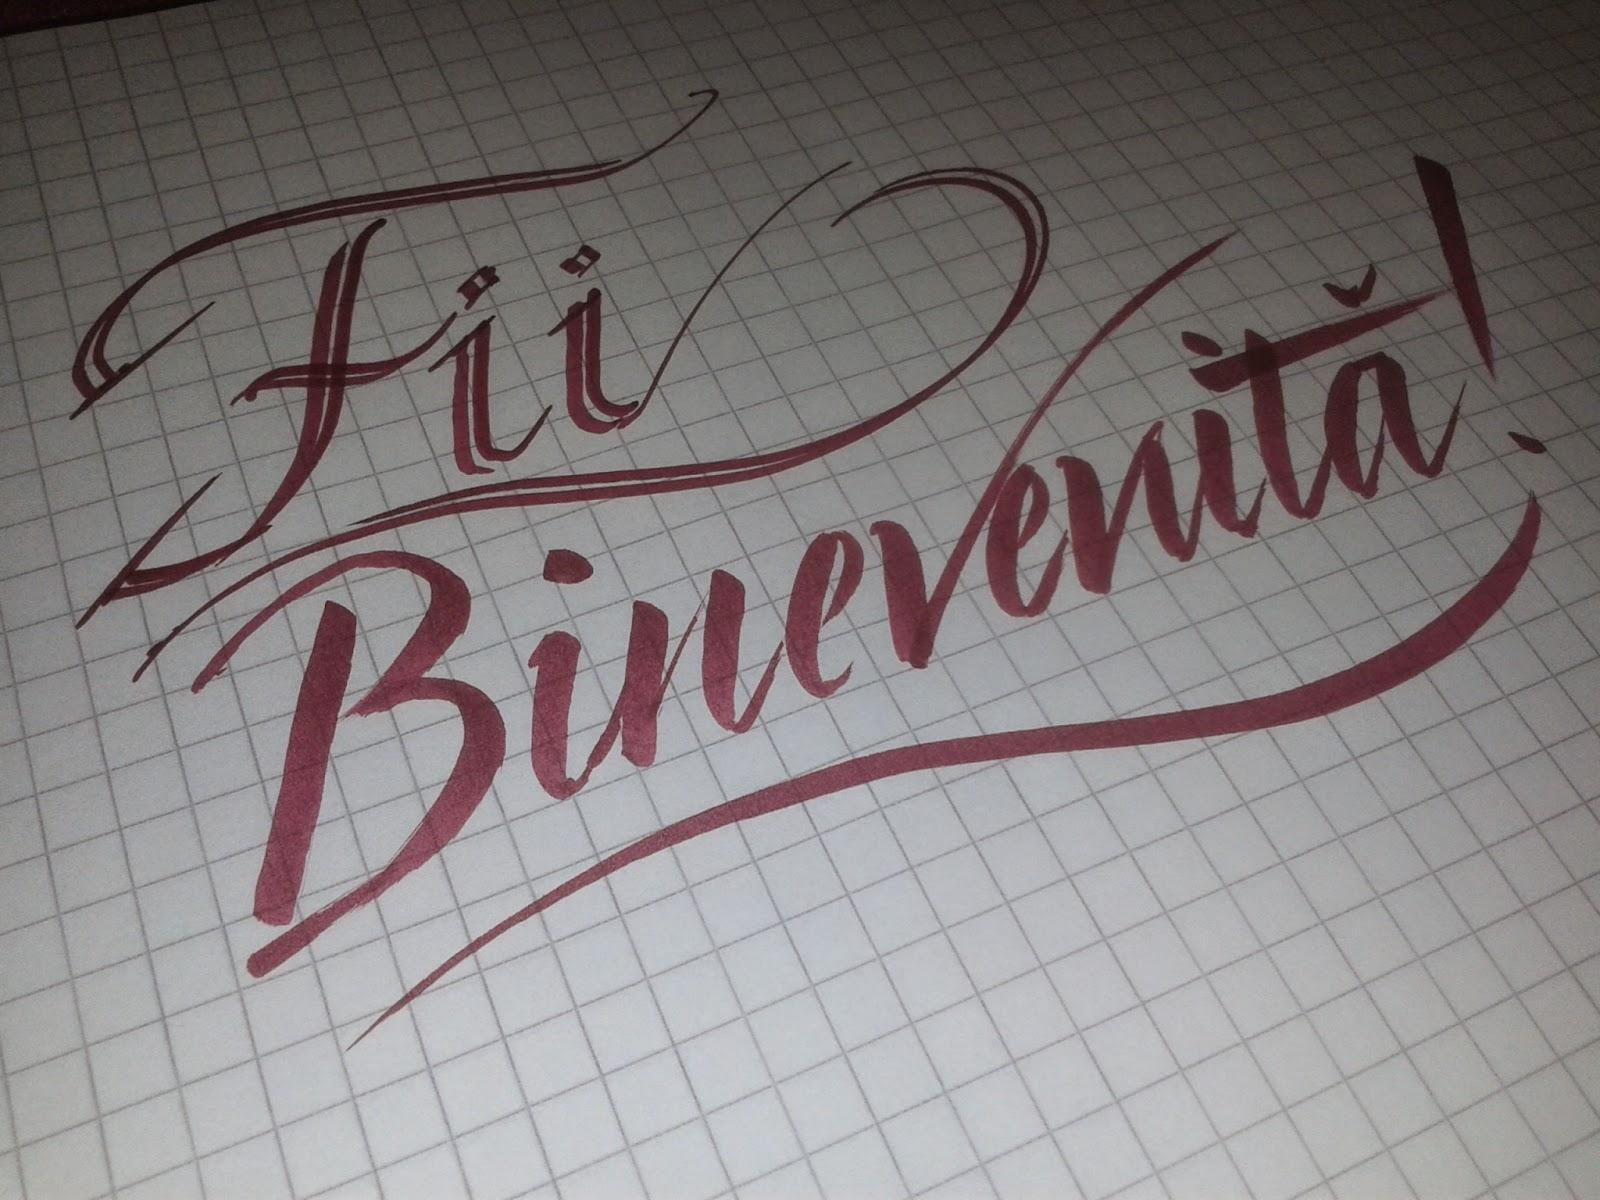 adio caligrafie, fii binevenita, caligrafie, caligraf, scris de mana, scoala, scris, curs de caligrafie